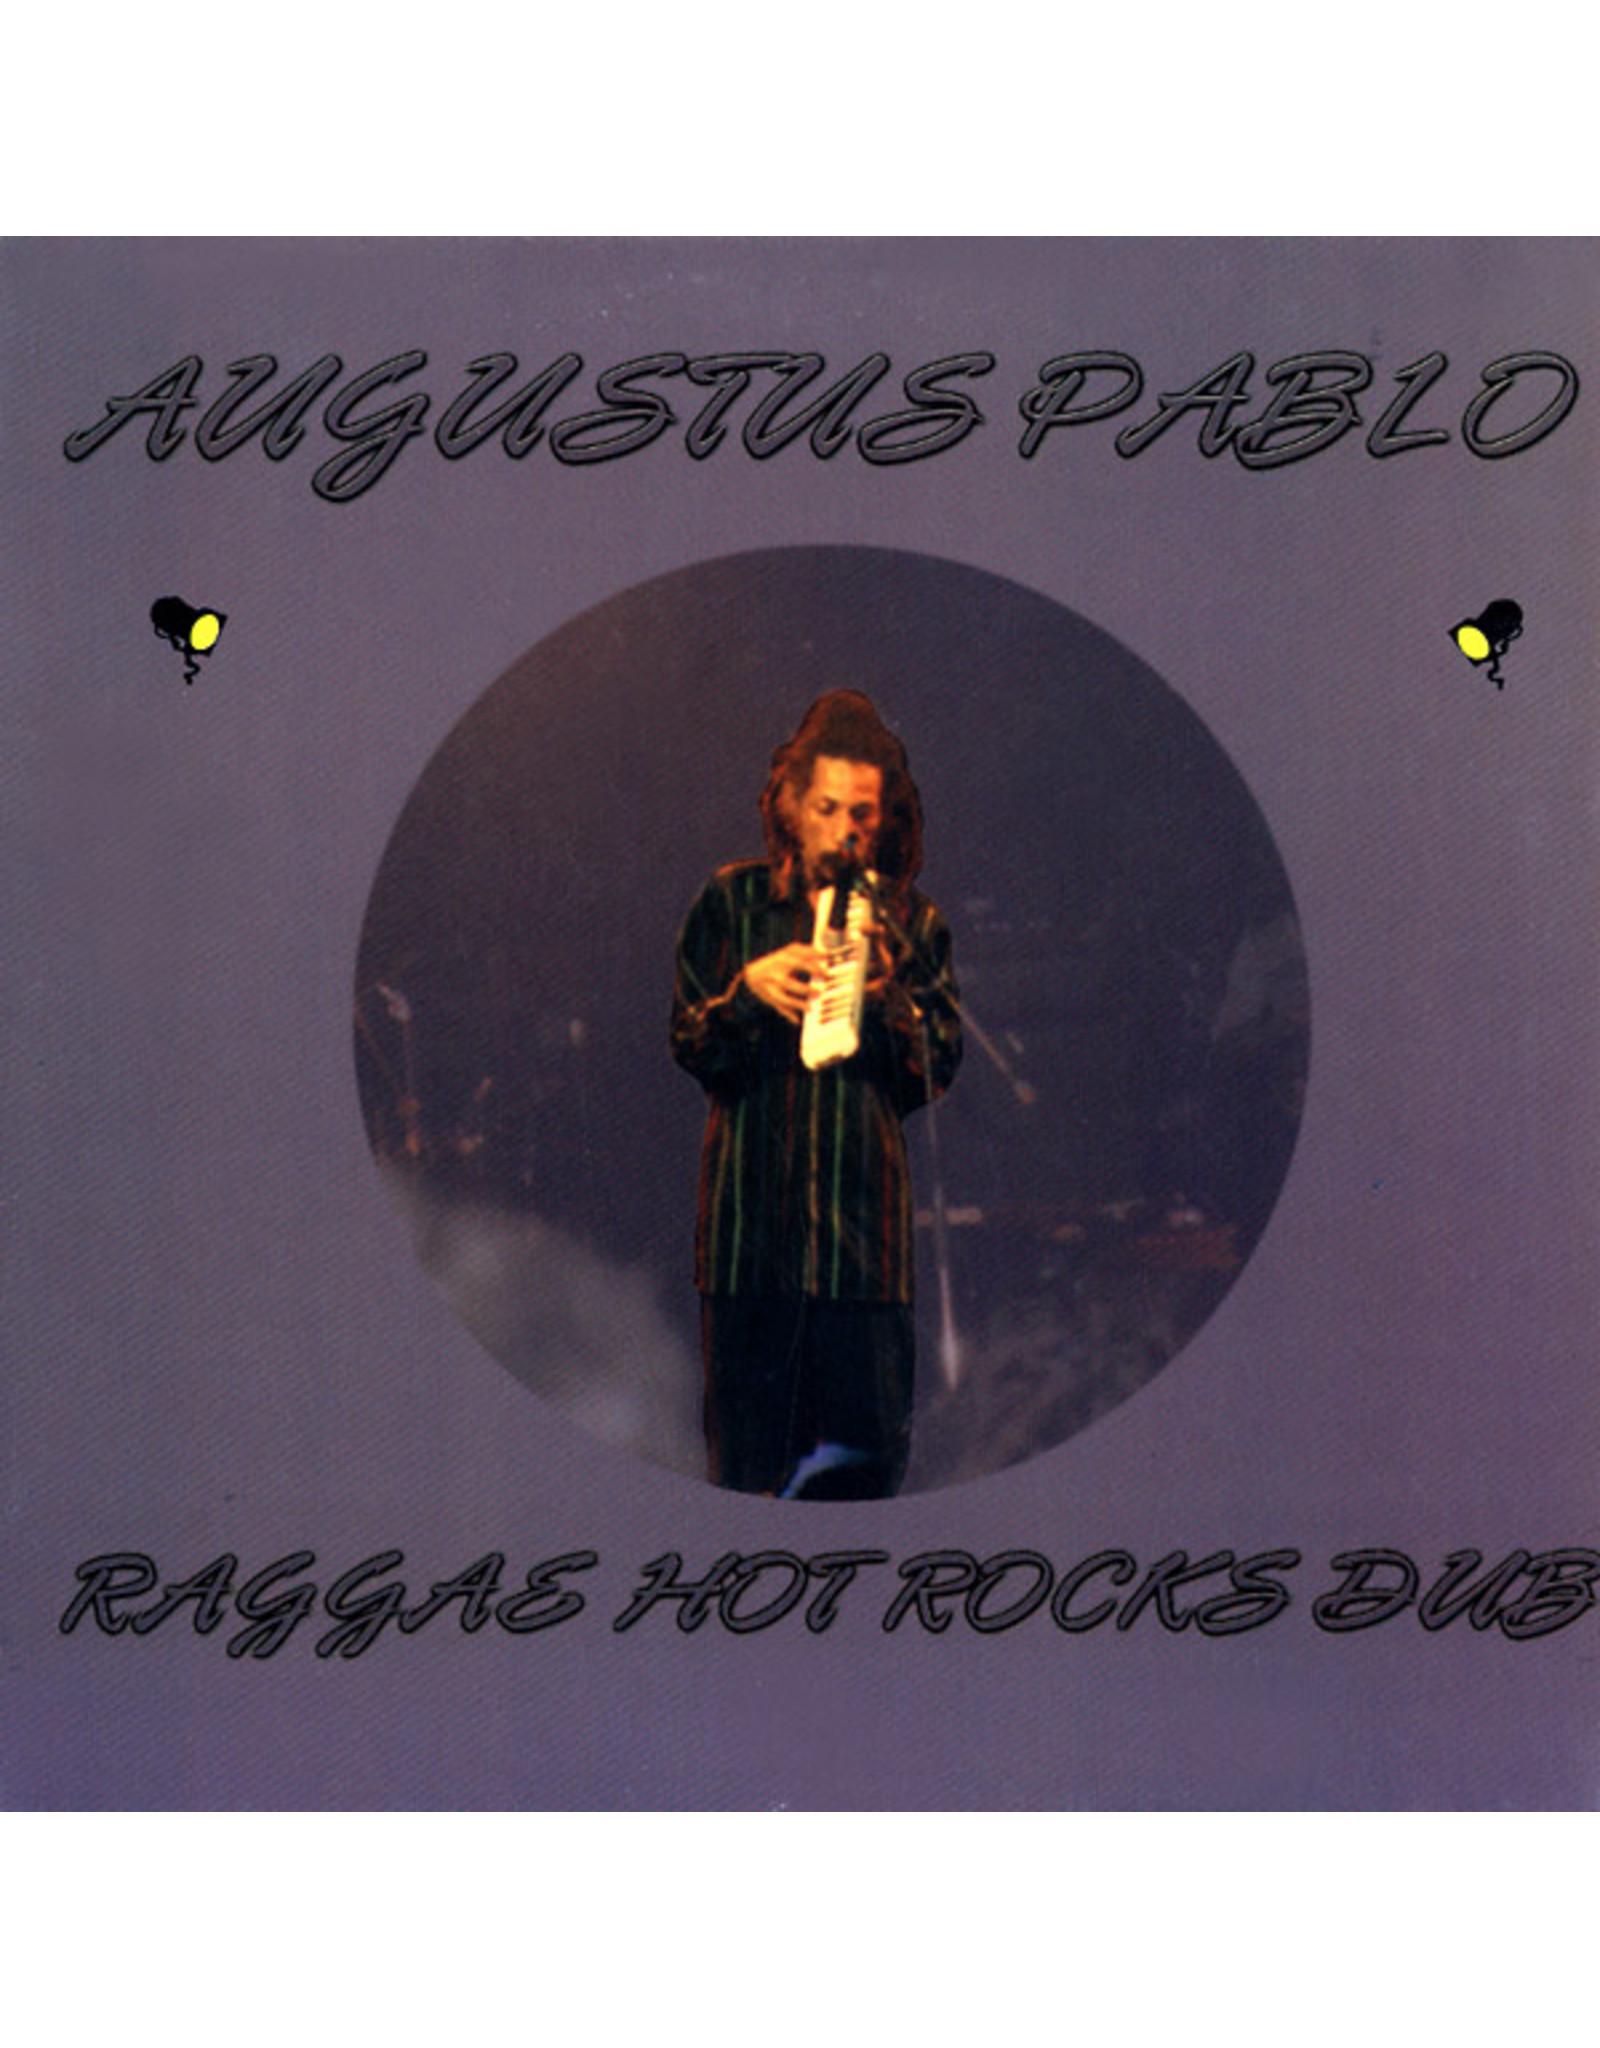 New Vinyl Augustus Pablo - Hot Rocks Dub LP